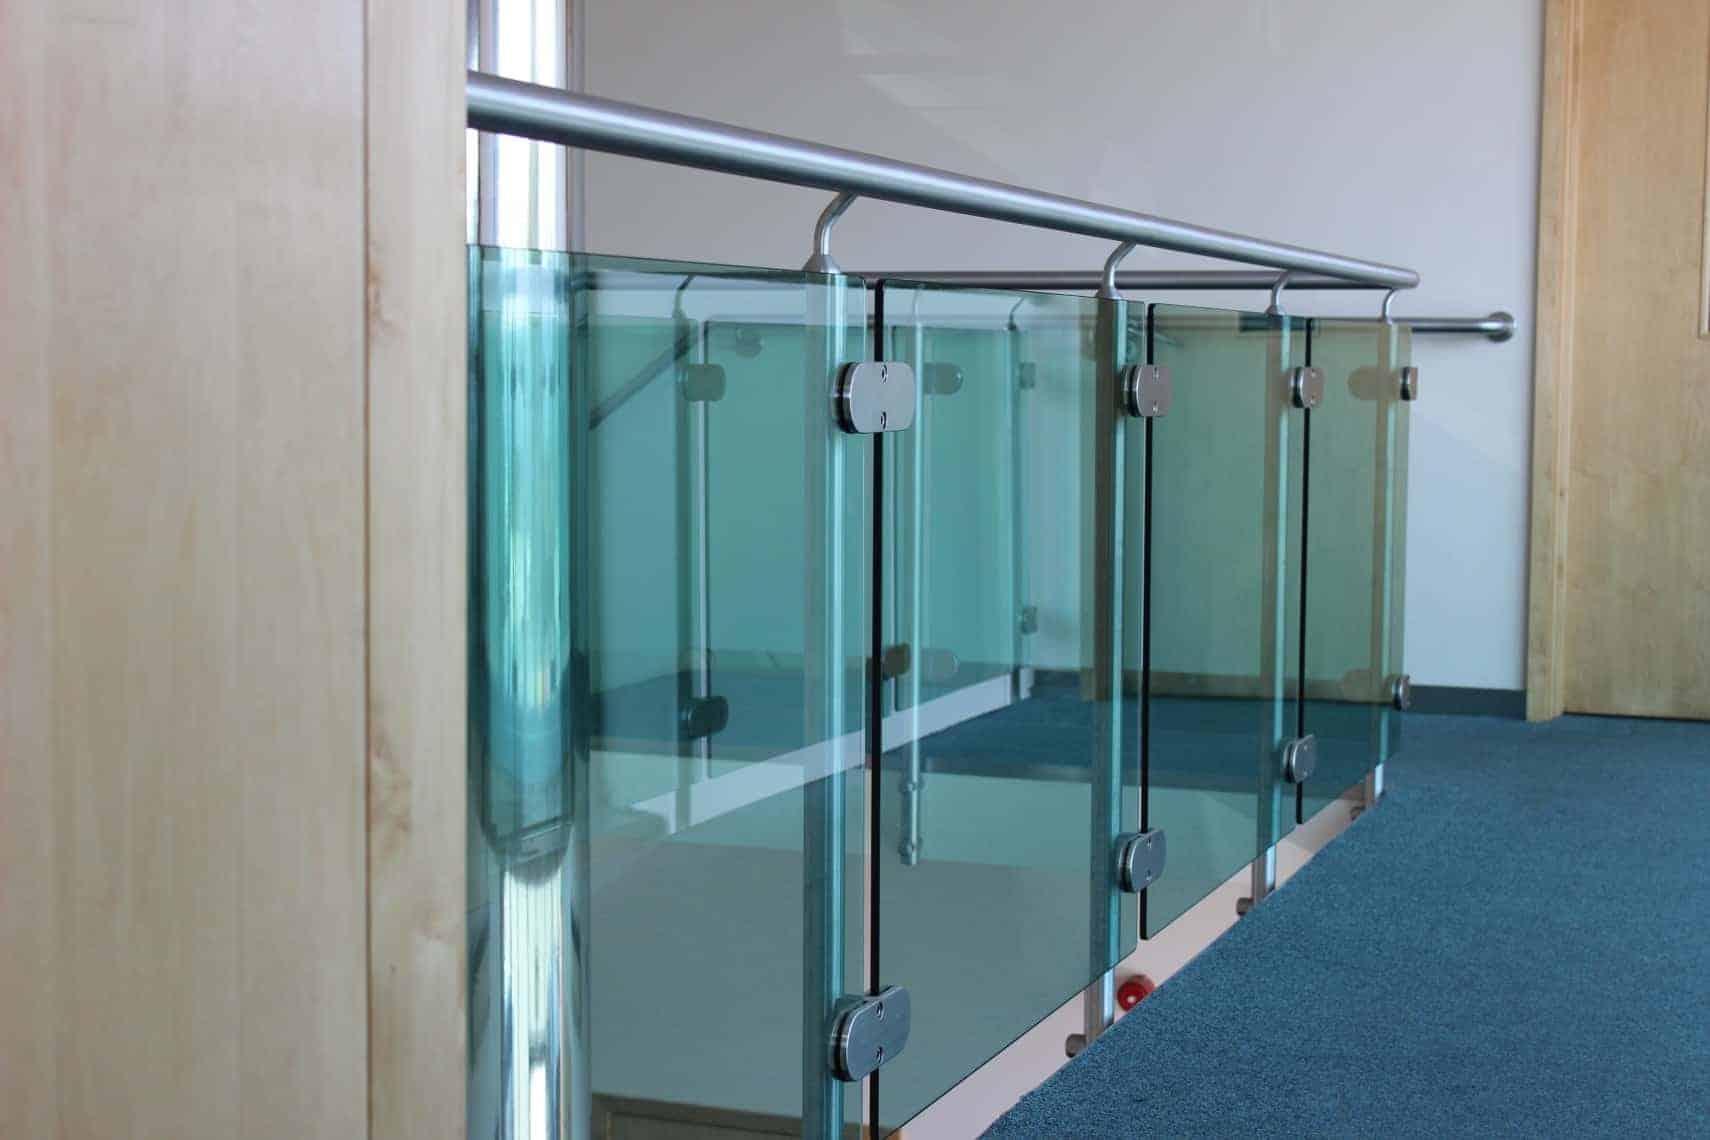 Balustrades Stainless Steel Balustrade